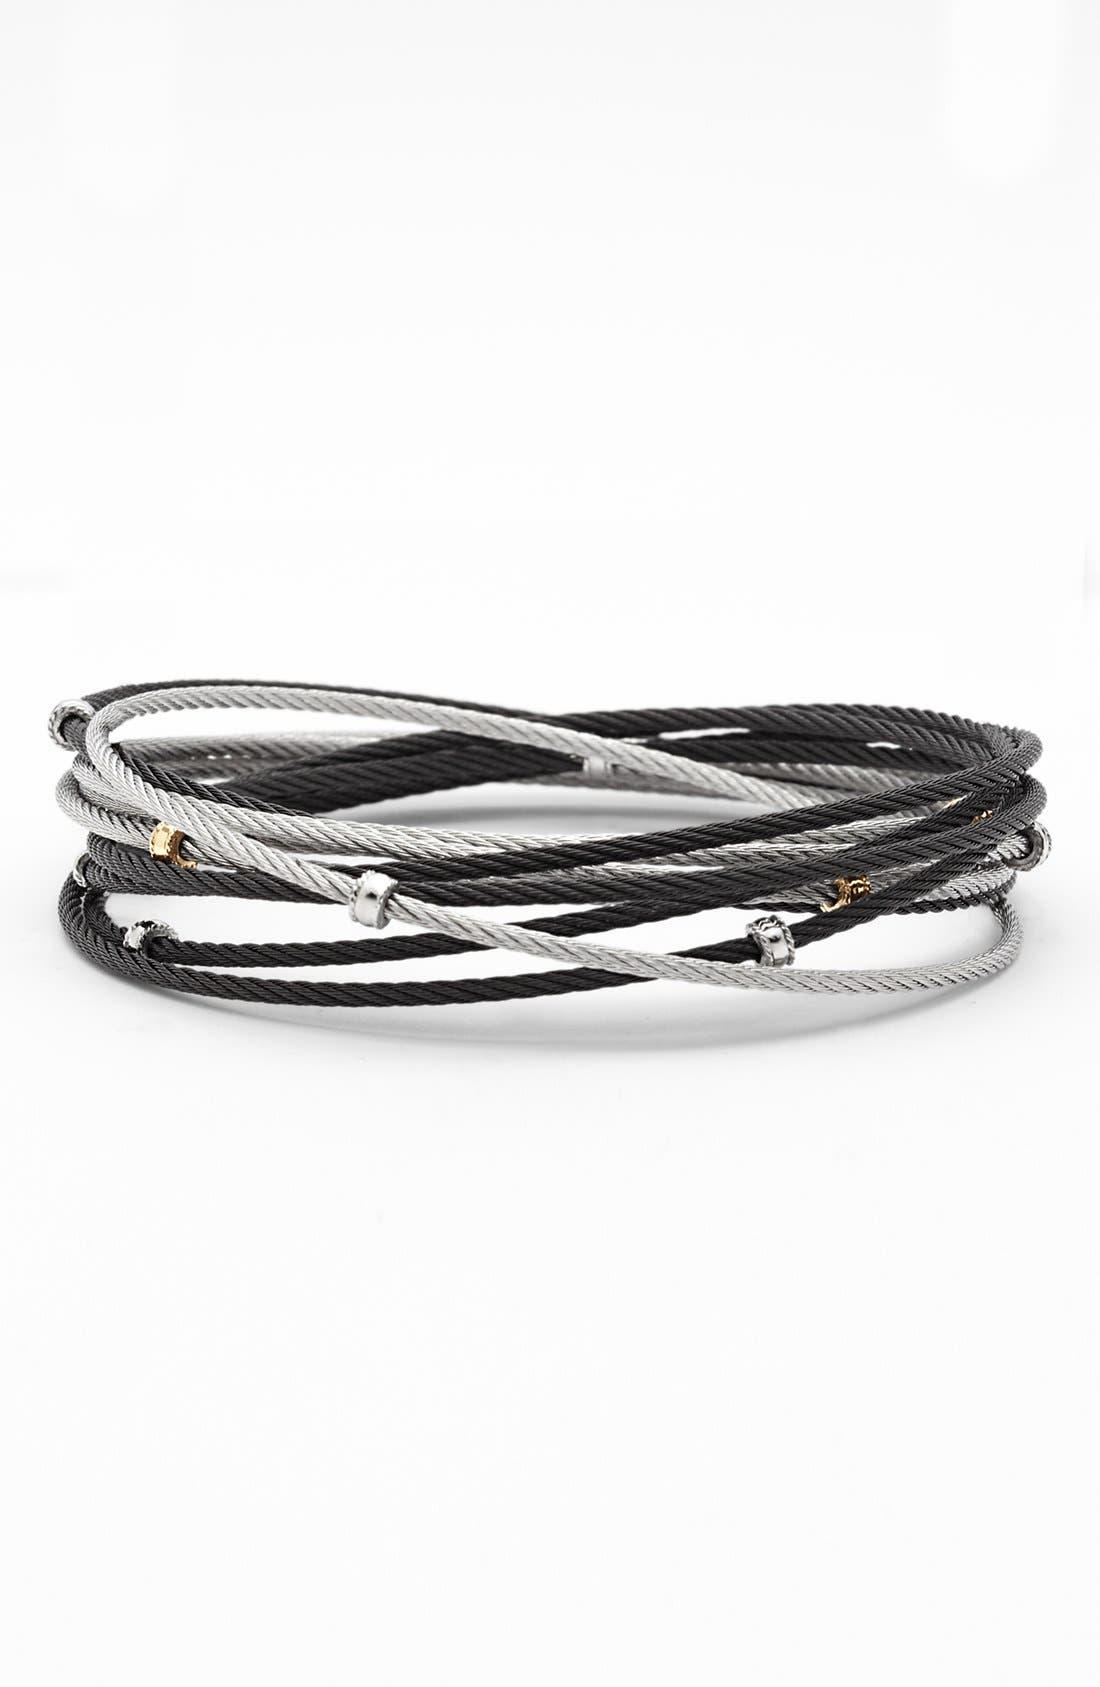 Main Image - ALOR® Interlocked Cable Bracelet Set